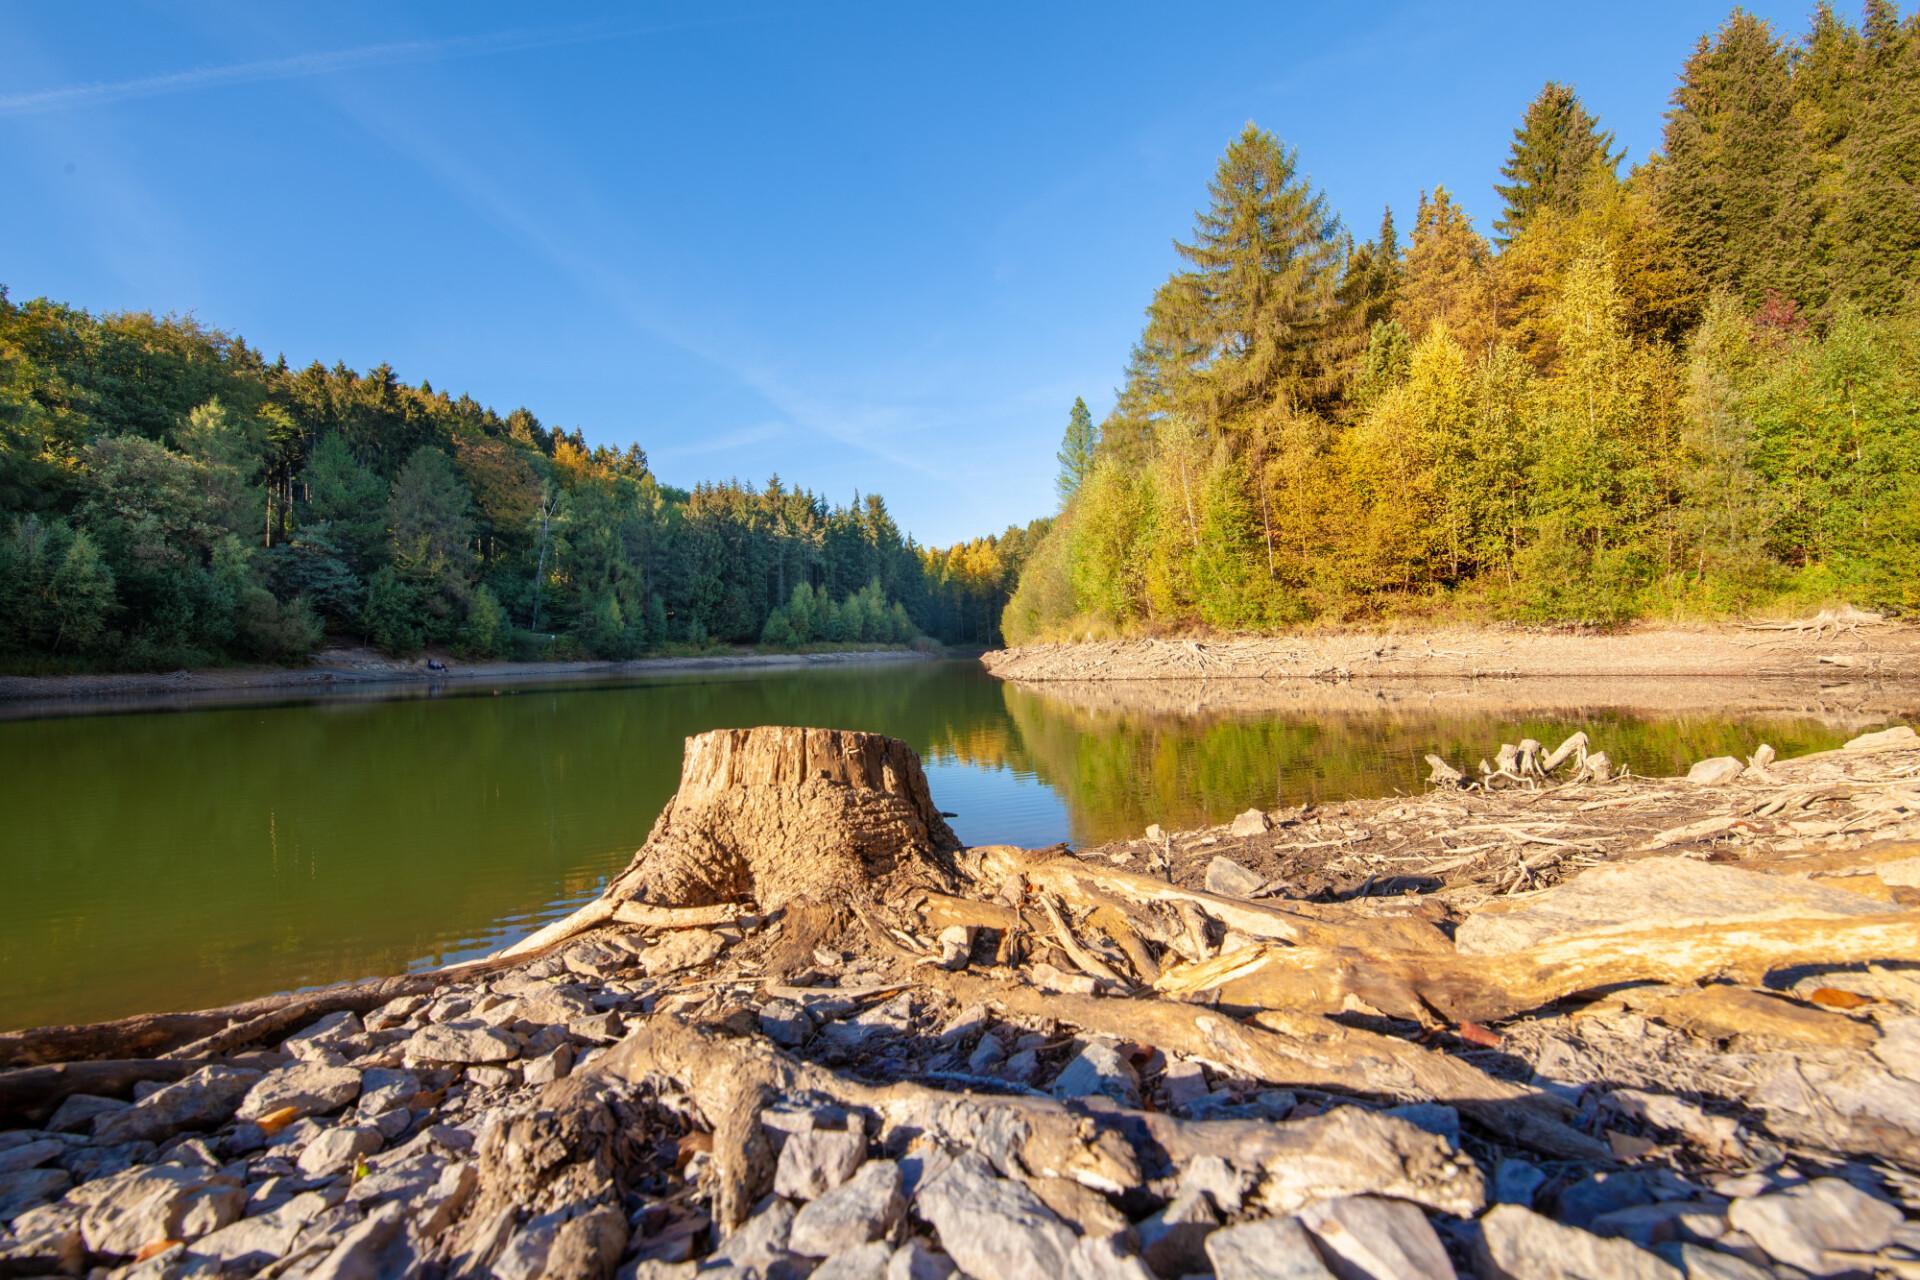 Reservoir in Germany